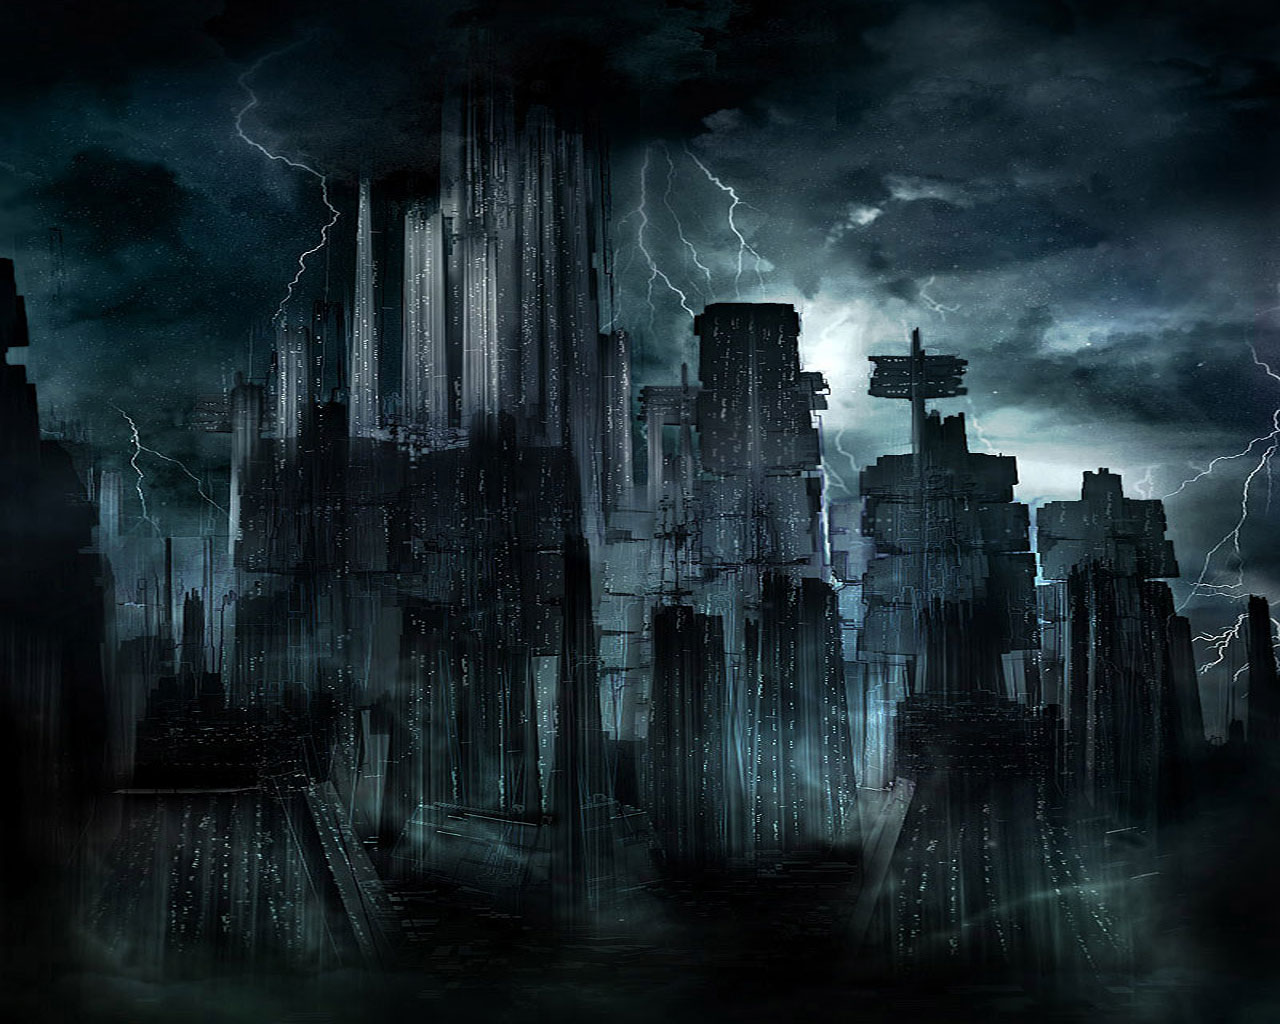 Downlad free Dark The Dark City wallpaper